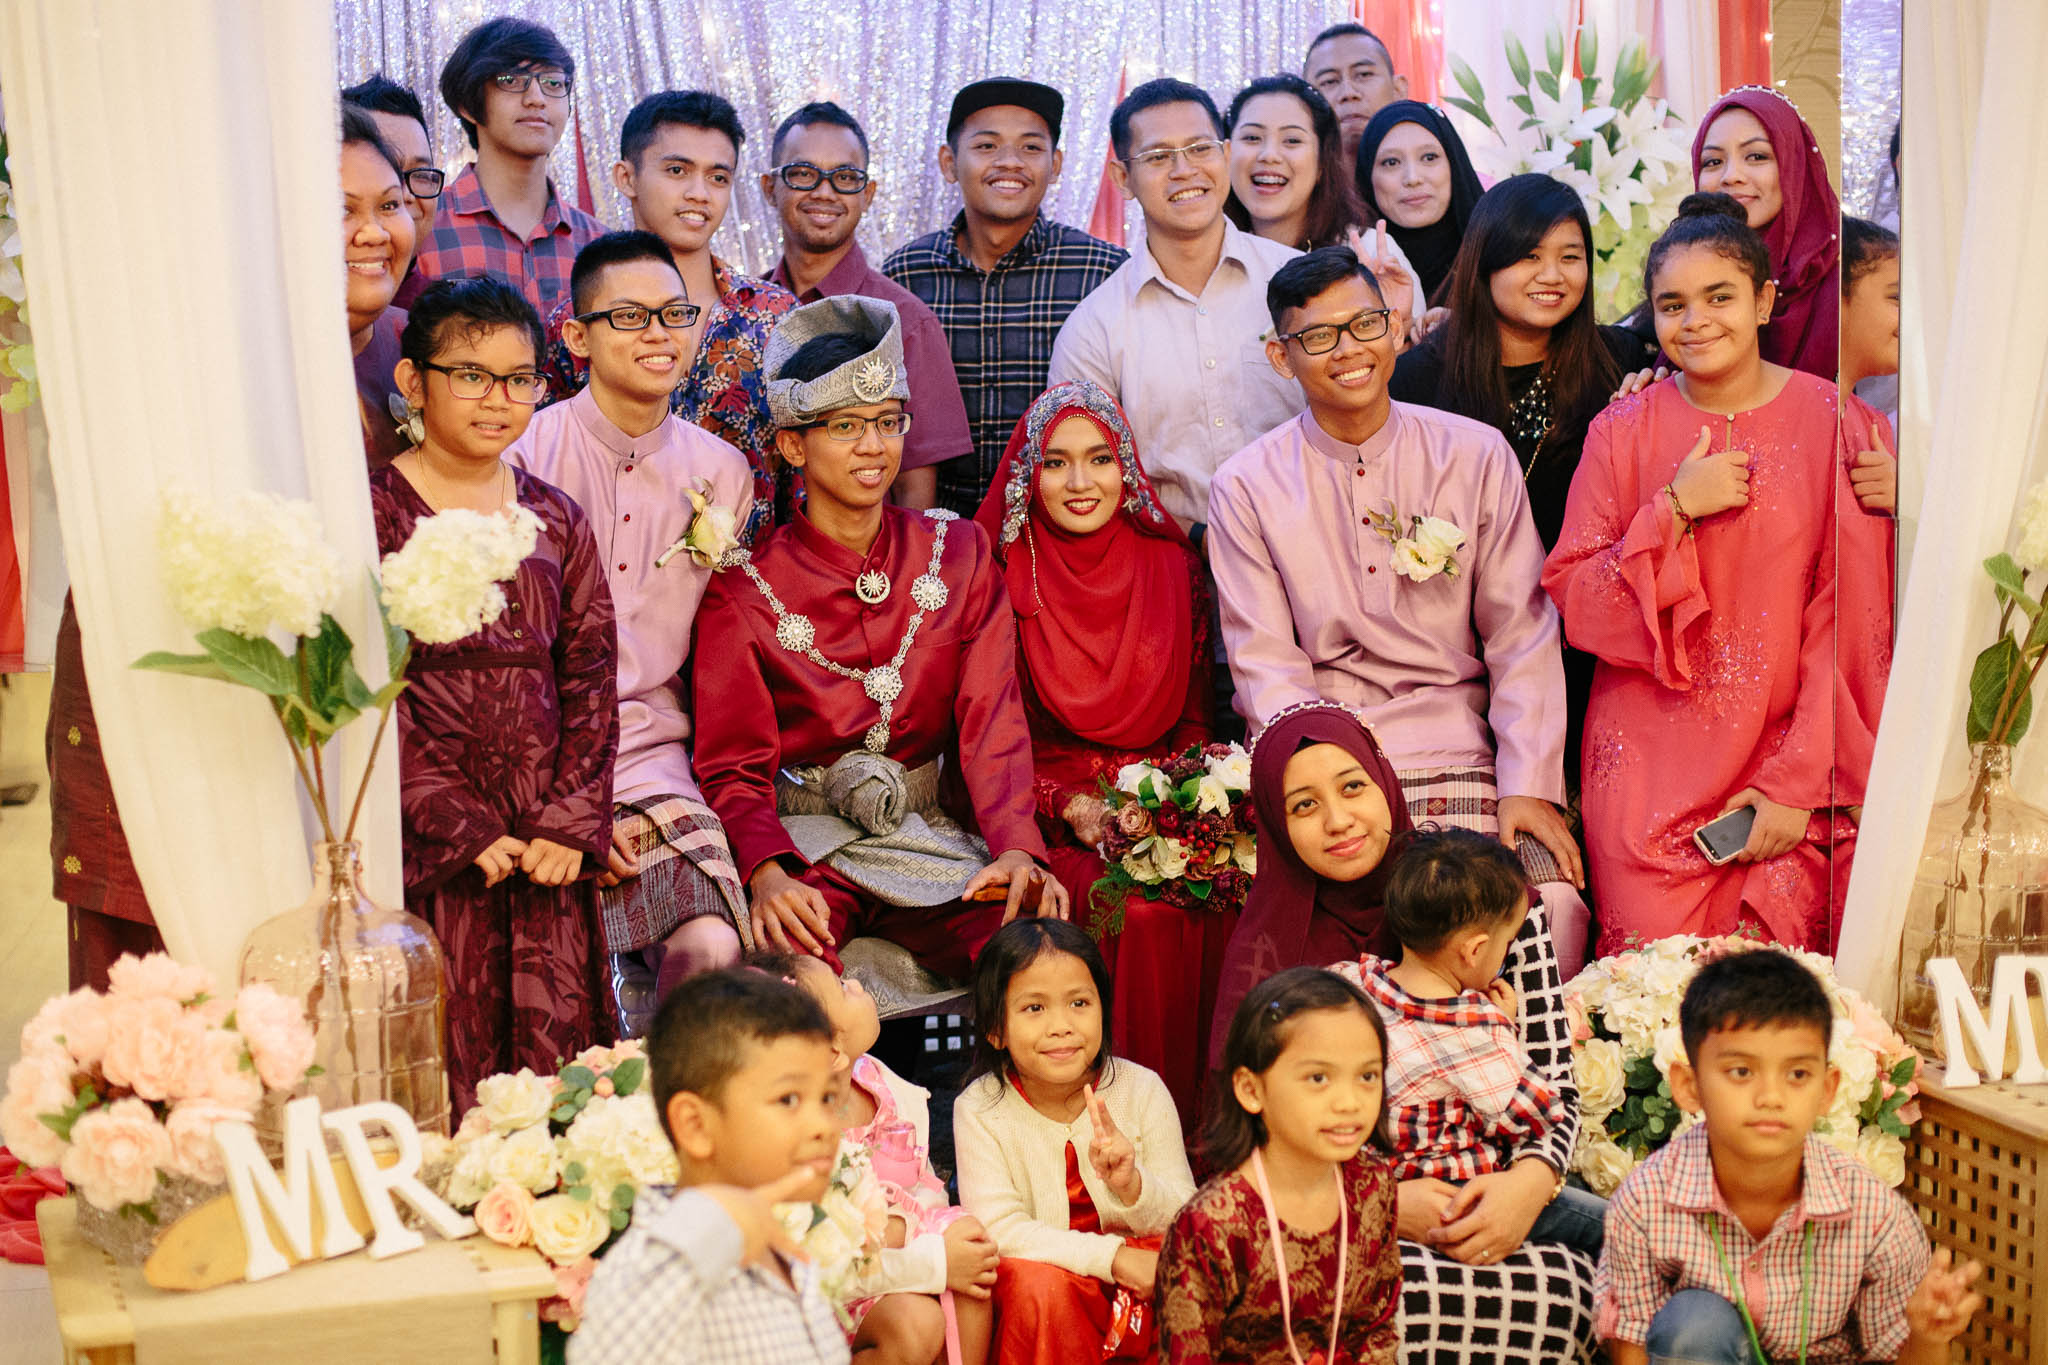 singapore-wedding-photographer-sharalyn-syazwan-063.jpg